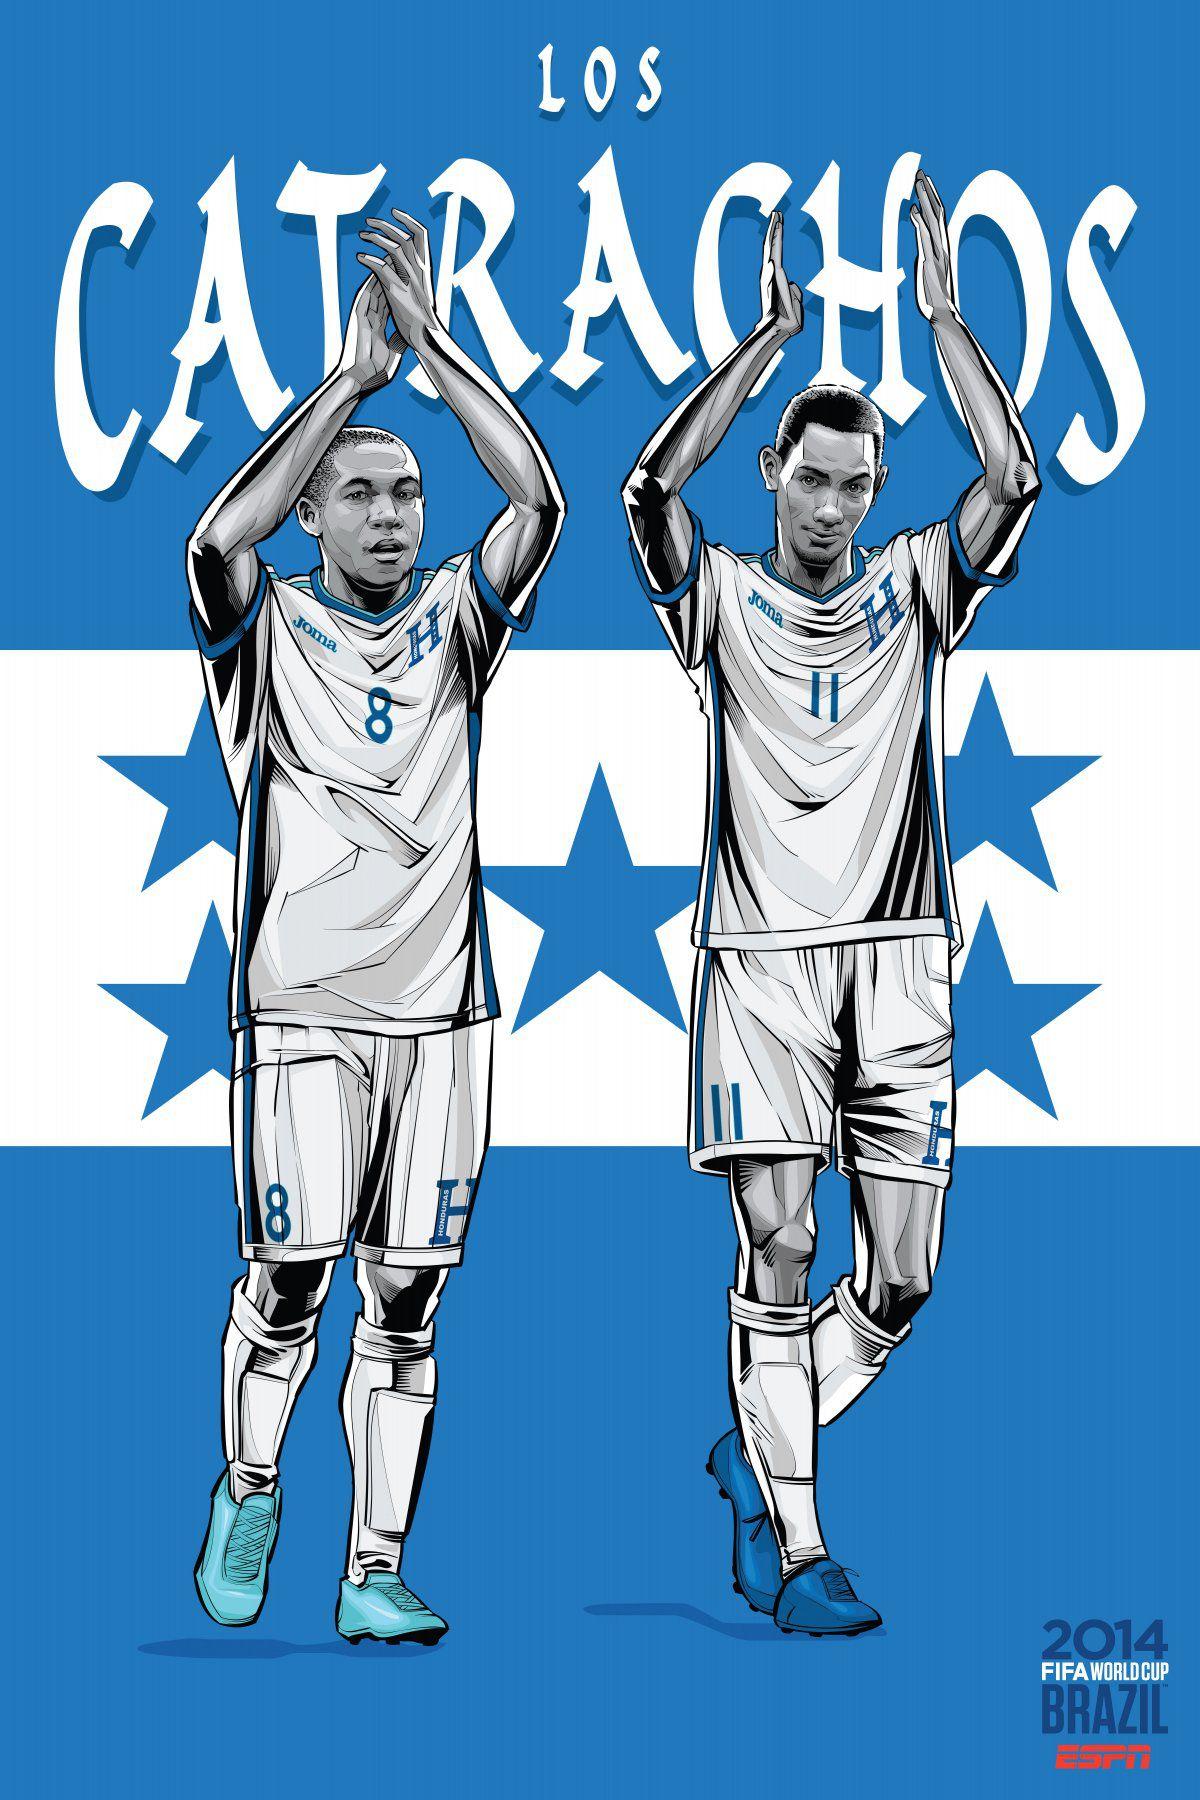 ESPN wordld cup poster brazil 2014 of Honduras